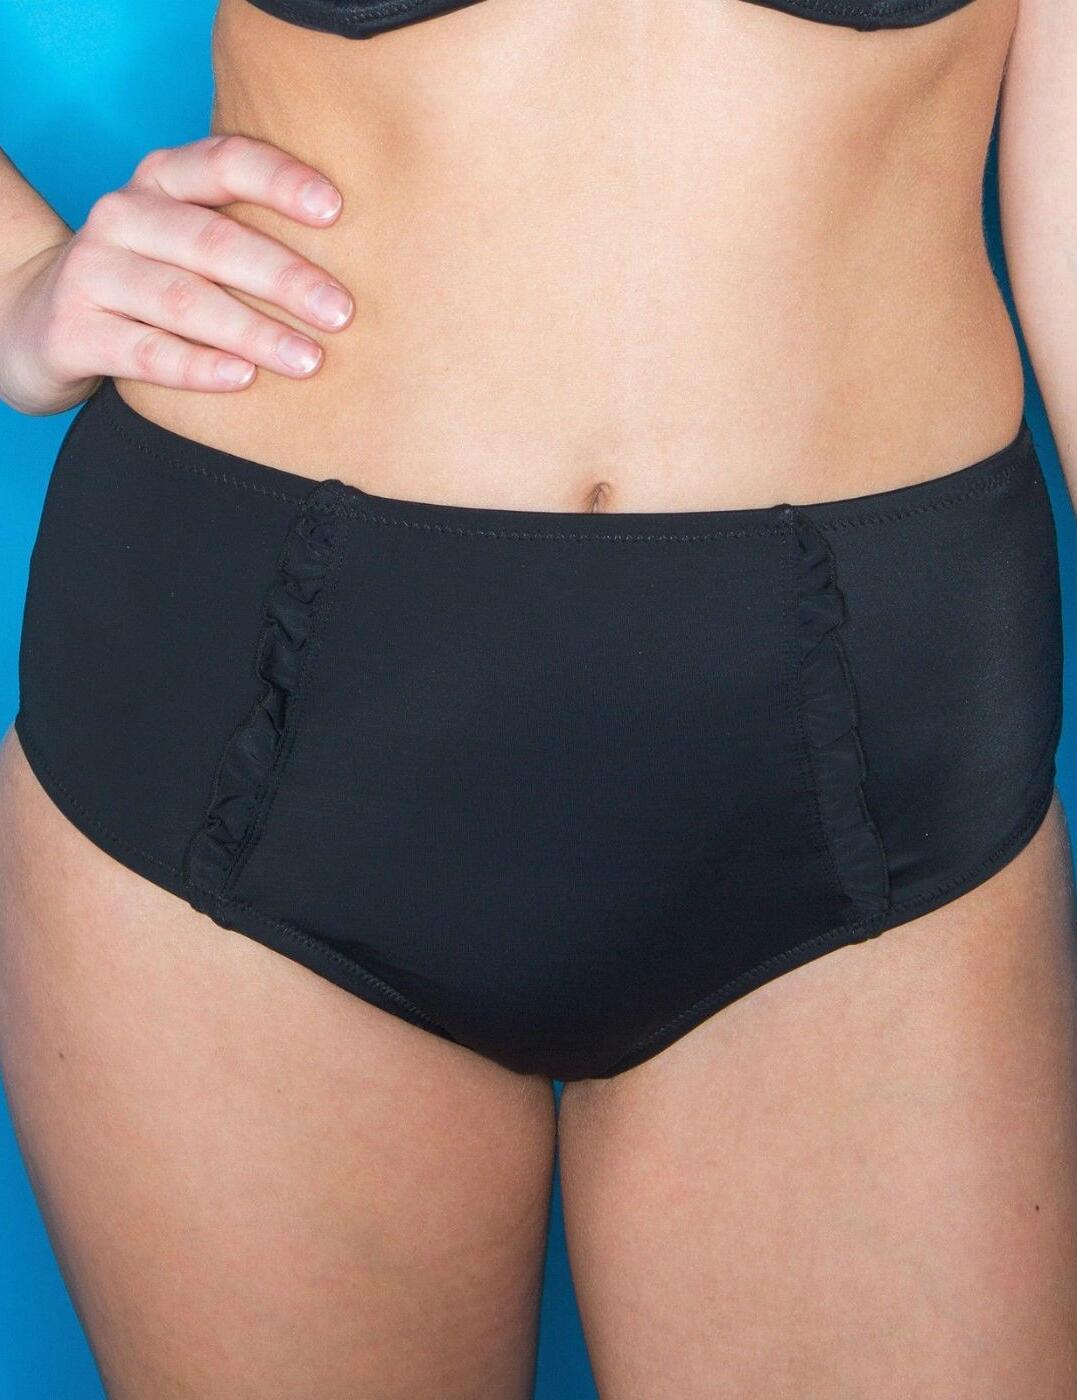 80003 Pour Moi Getaway Control Bikini Brief - 80003 Black